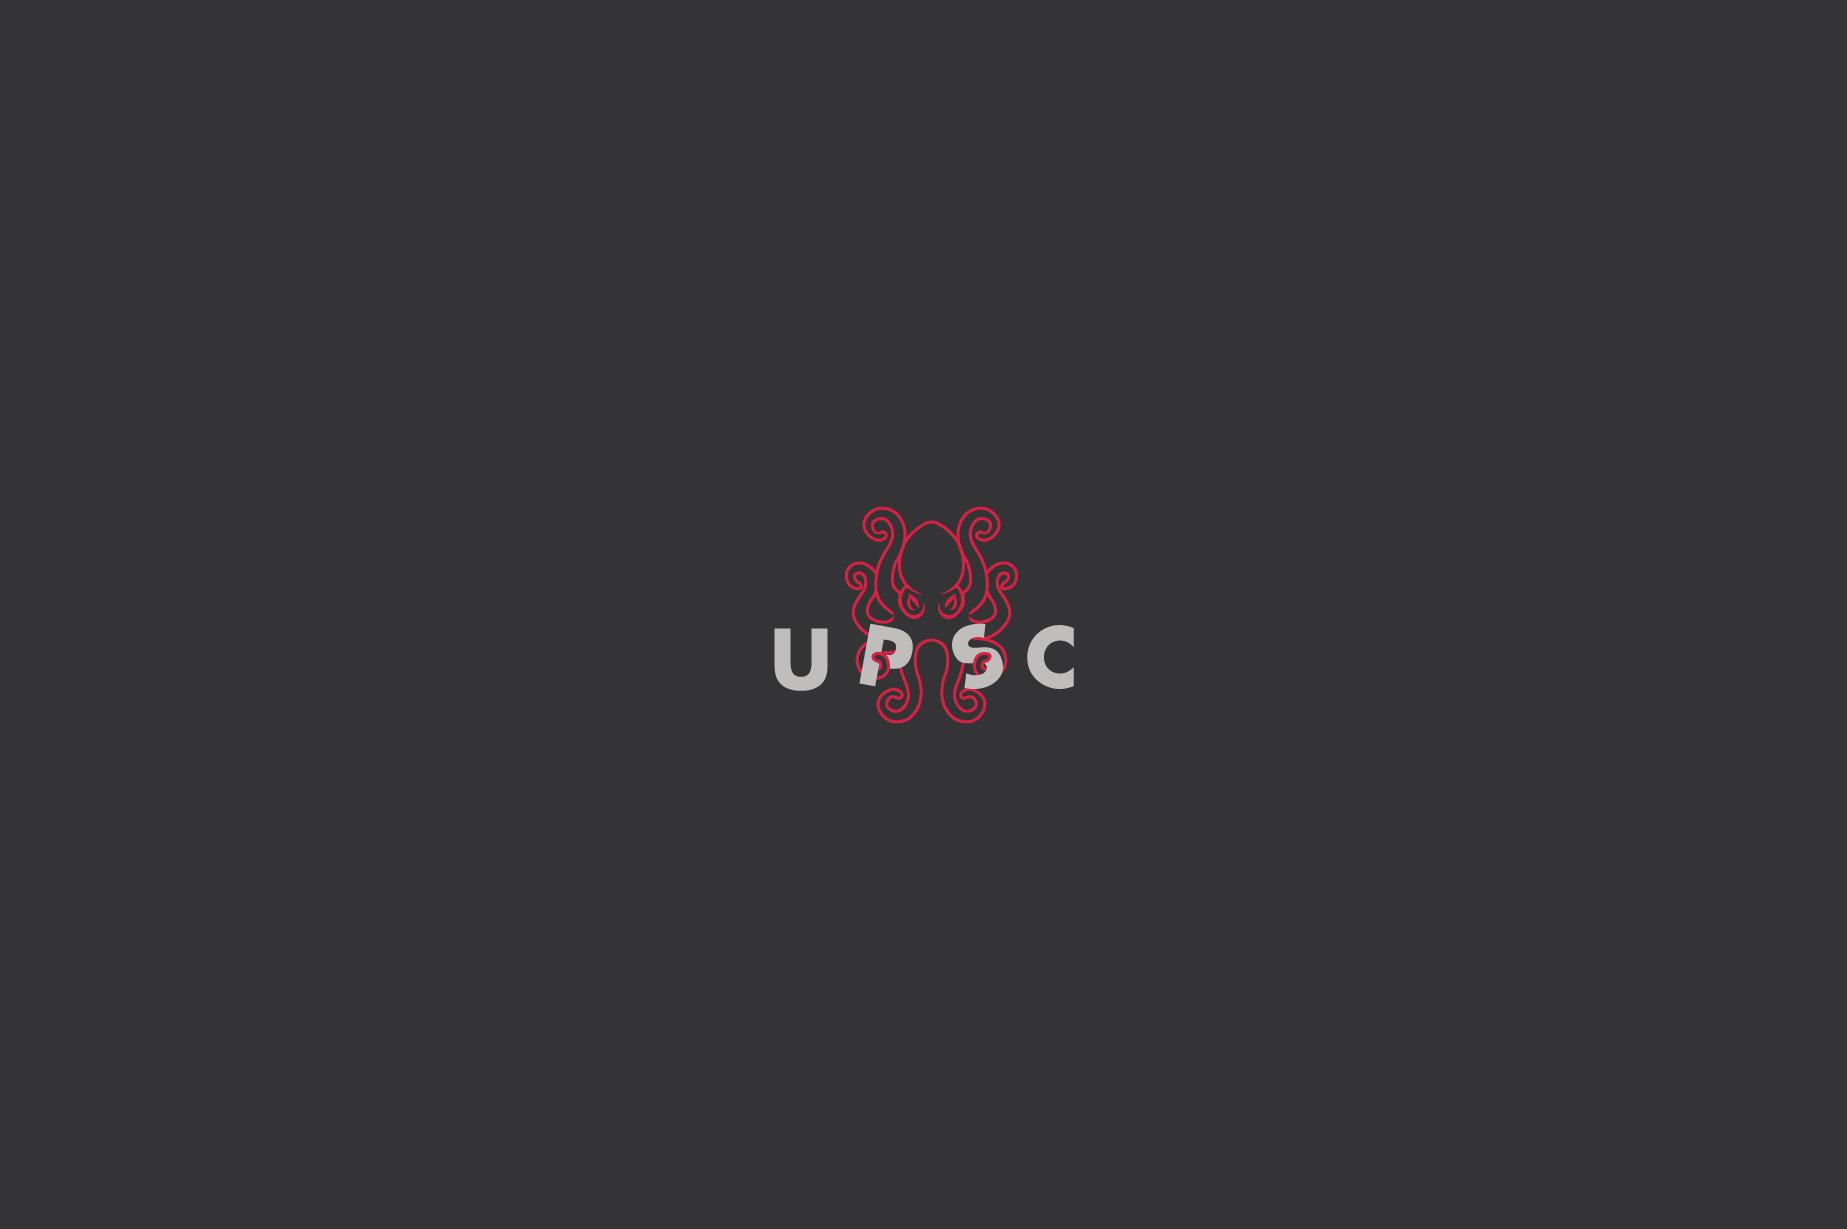 upsc-squid.jpg